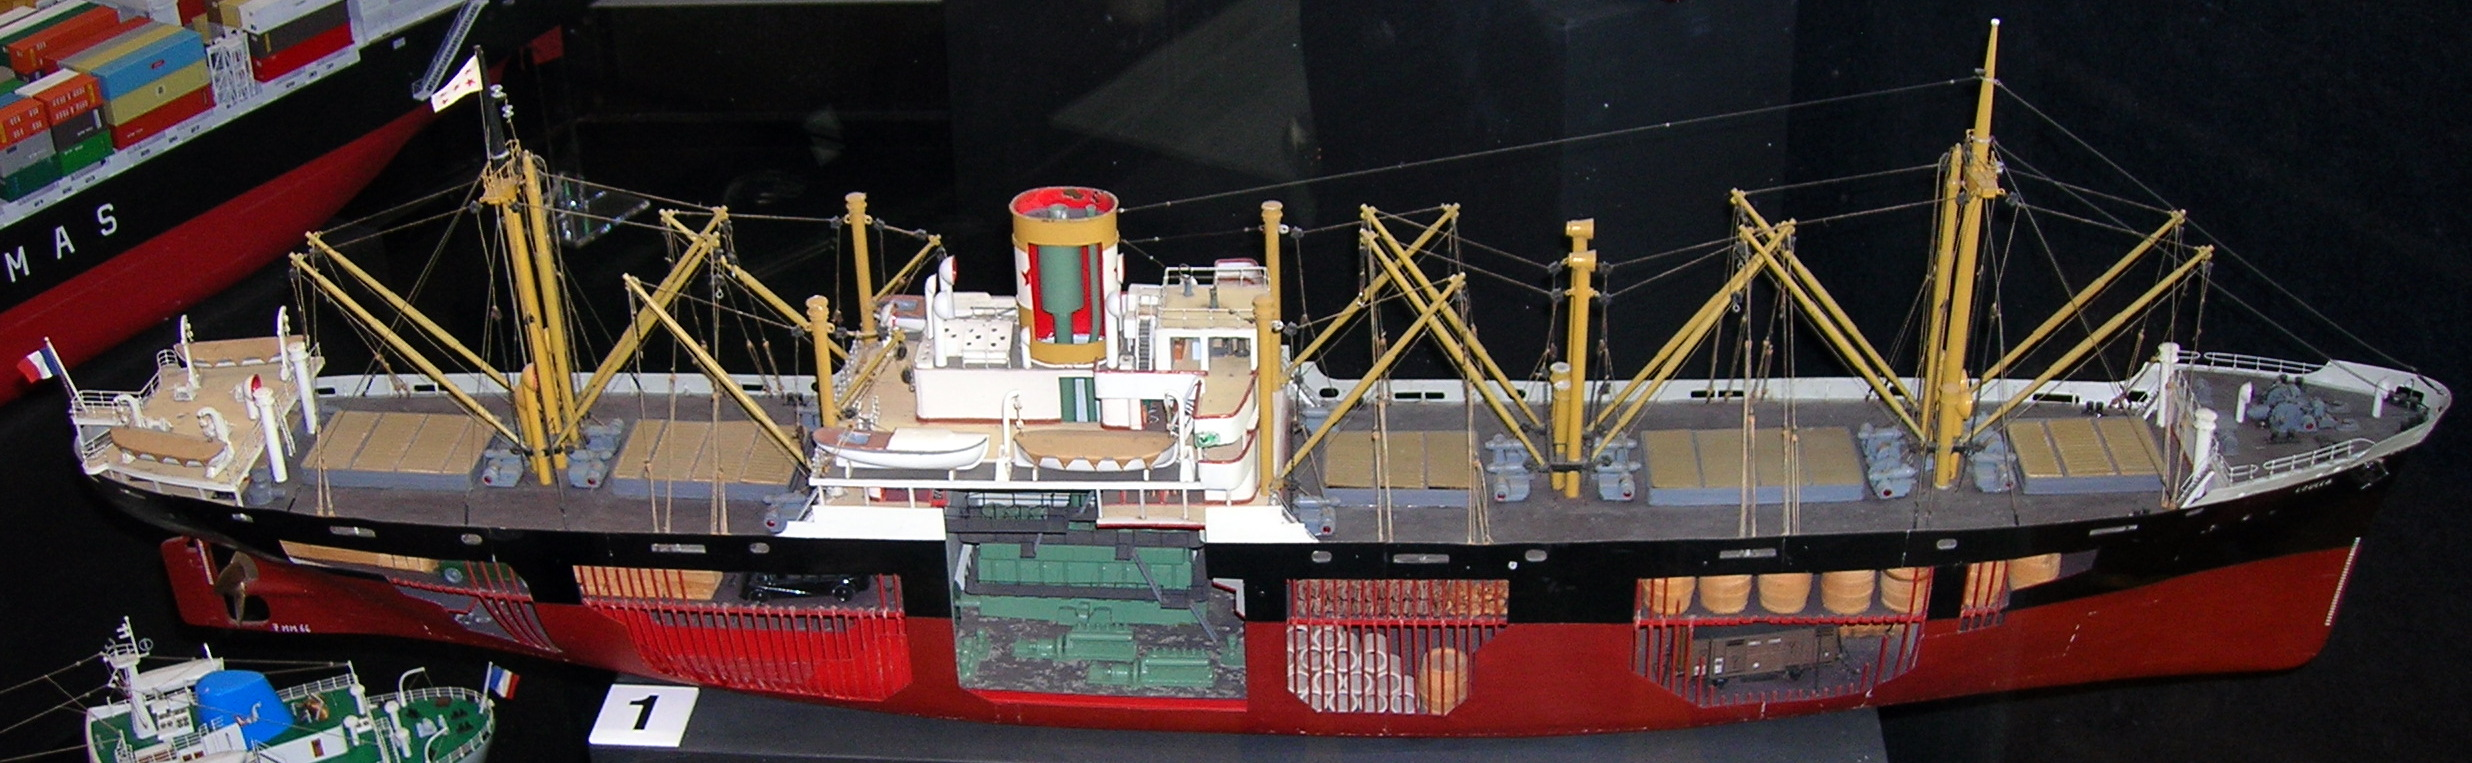 File:Loulea cargo ship model.jpg - Wikimedia Commons